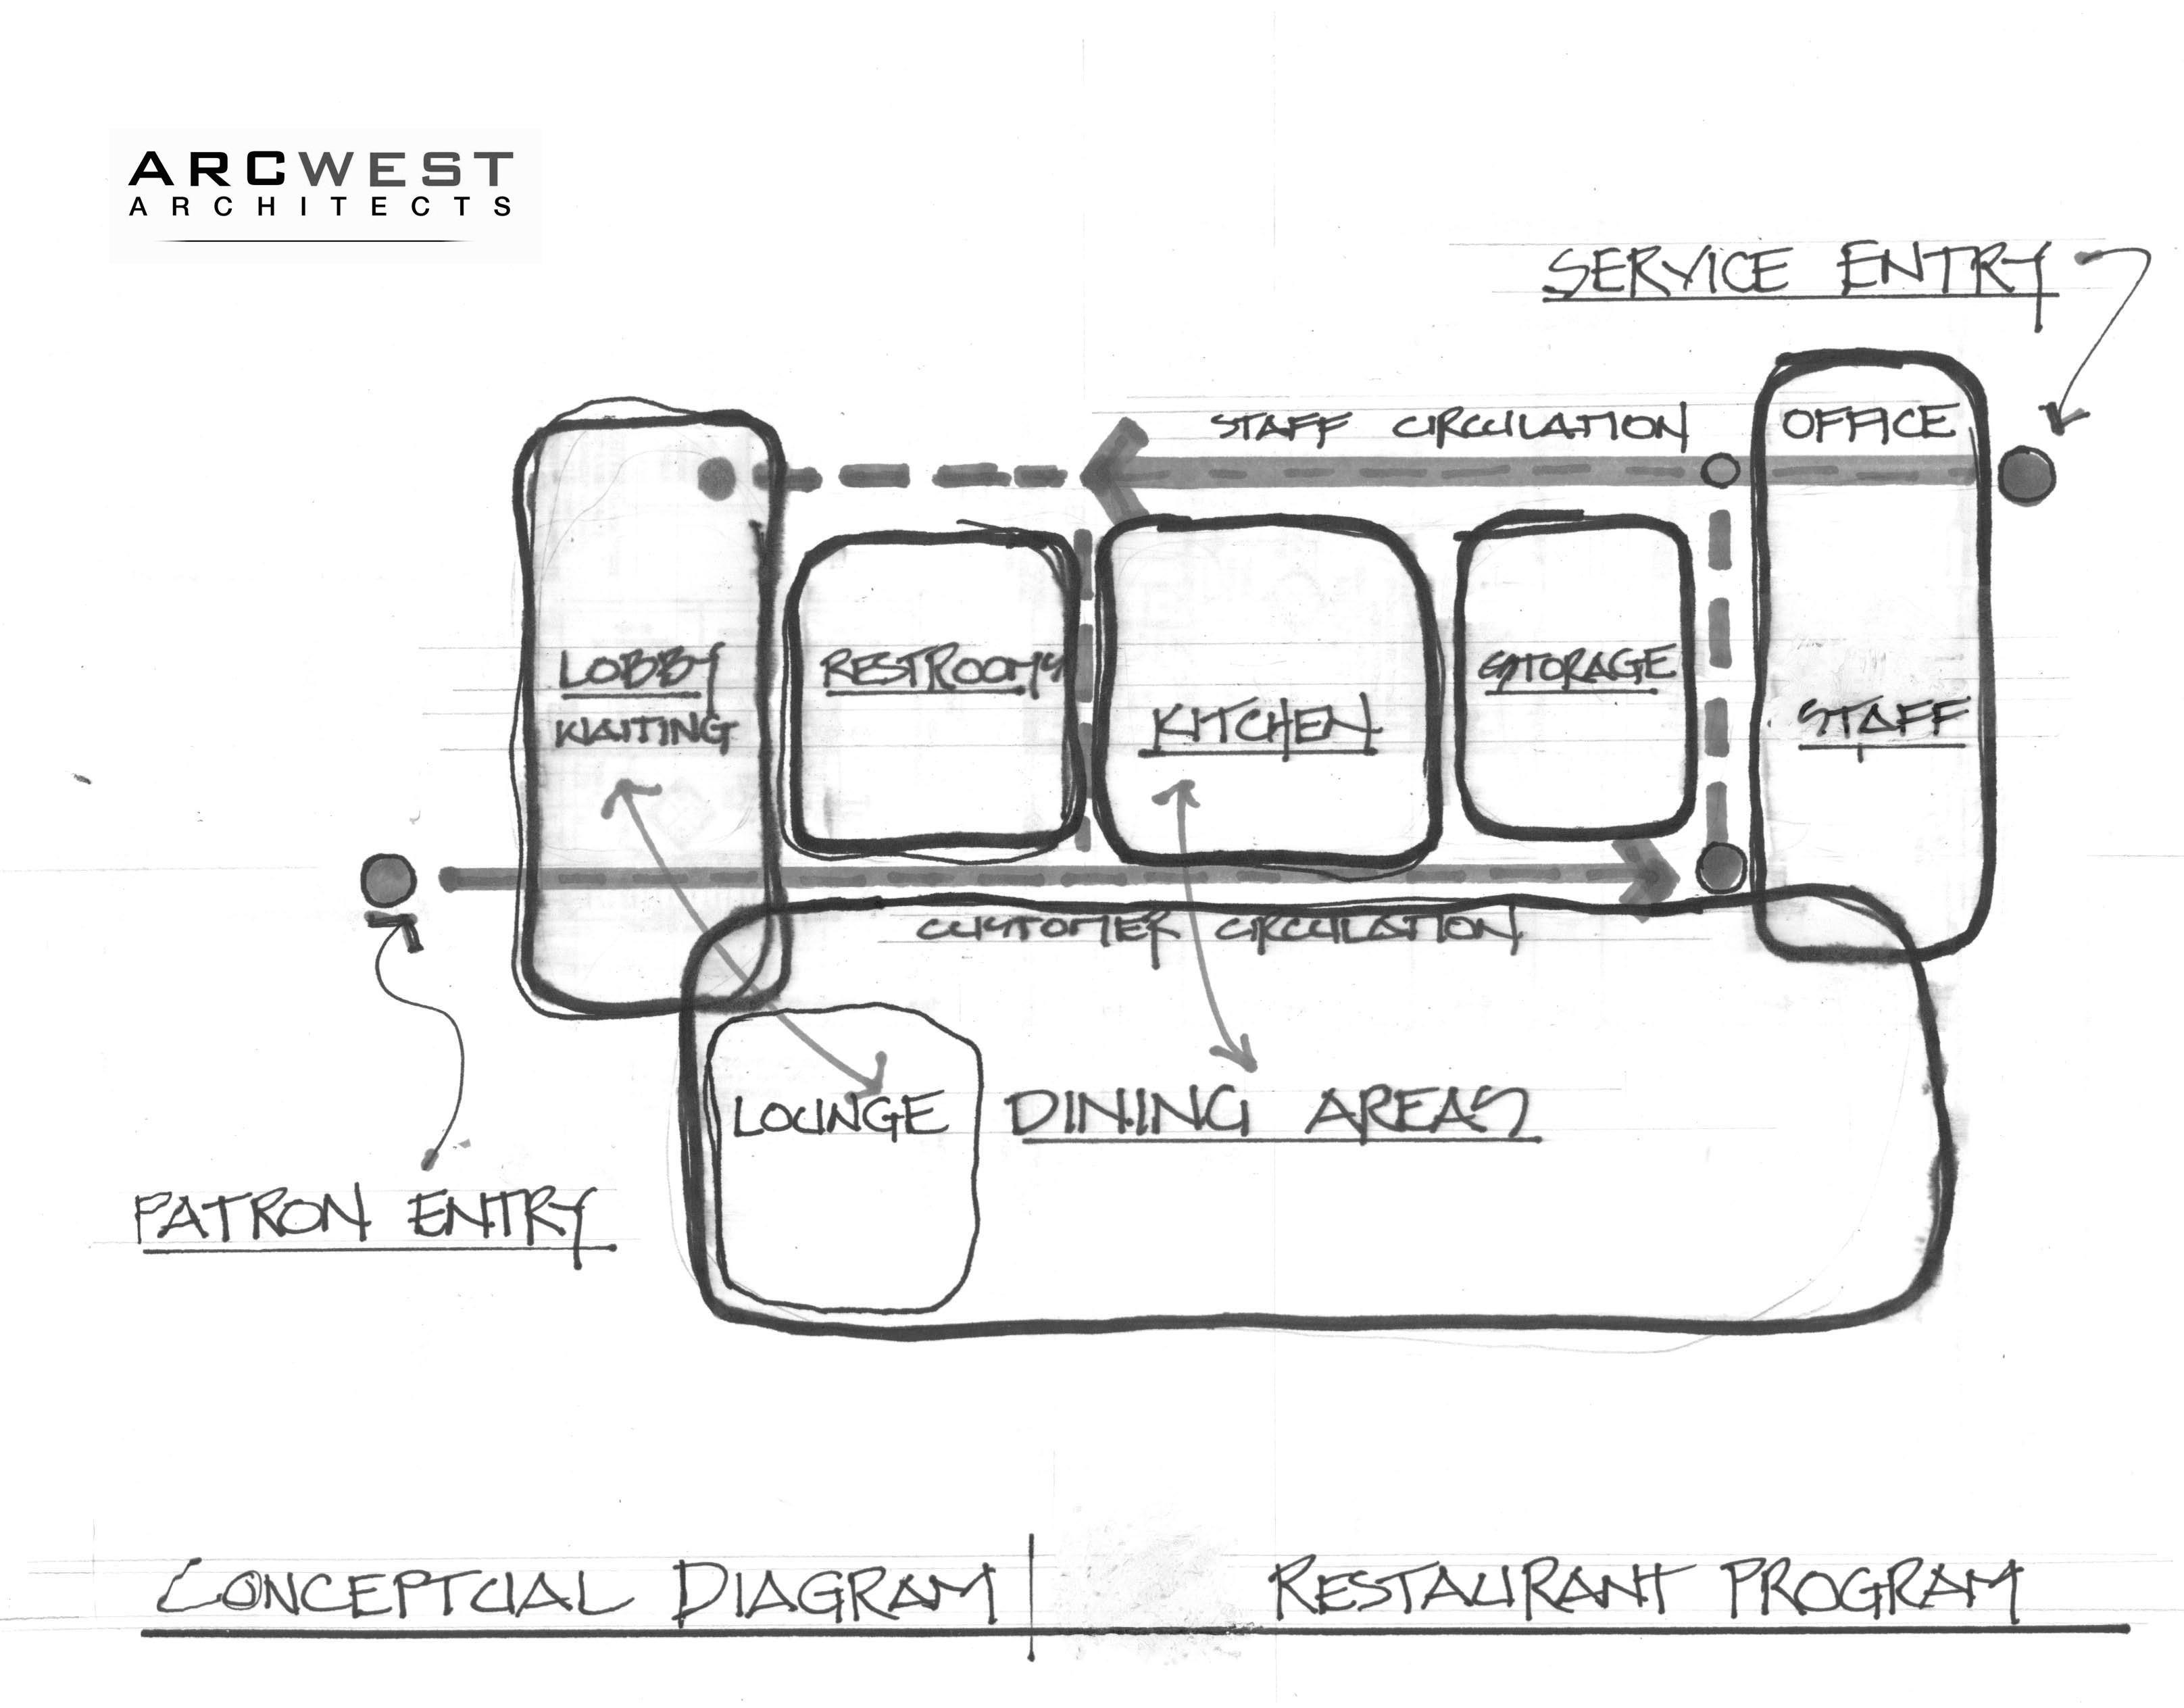 Restaurant program diagram r1 architecture design for Types of architectural design concepts